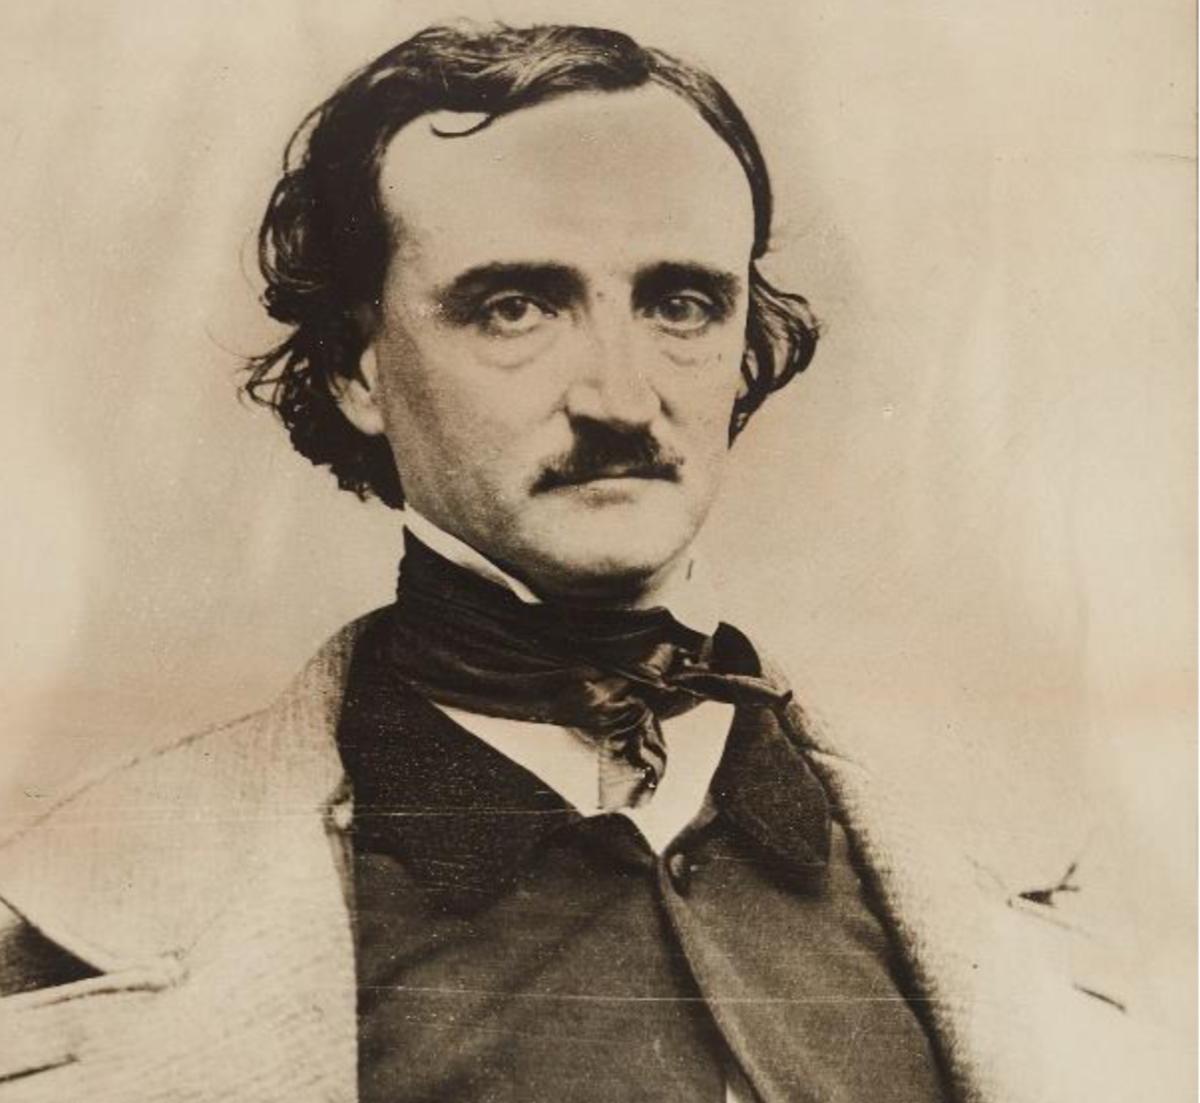 Analysis of Poem Bridal Ballad by Edgar Allan Poe